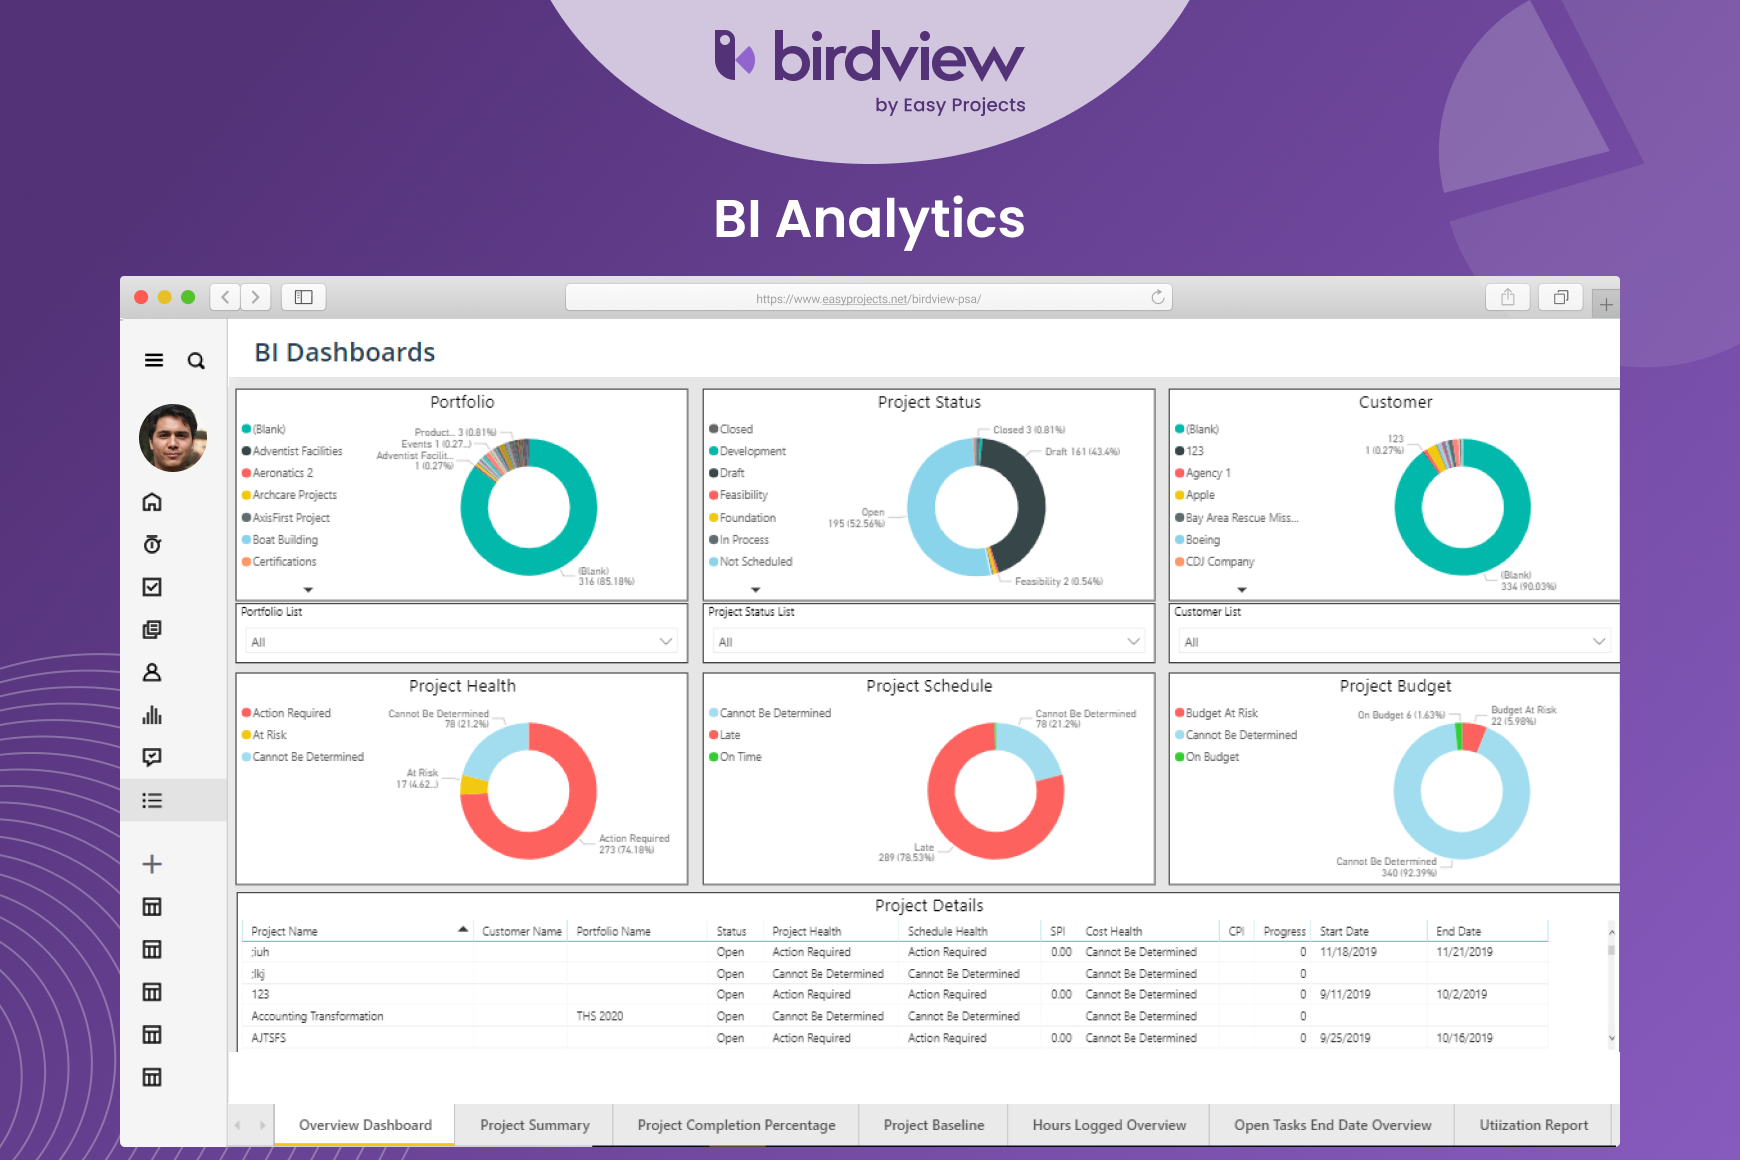 Birdview PSA - BI Reports